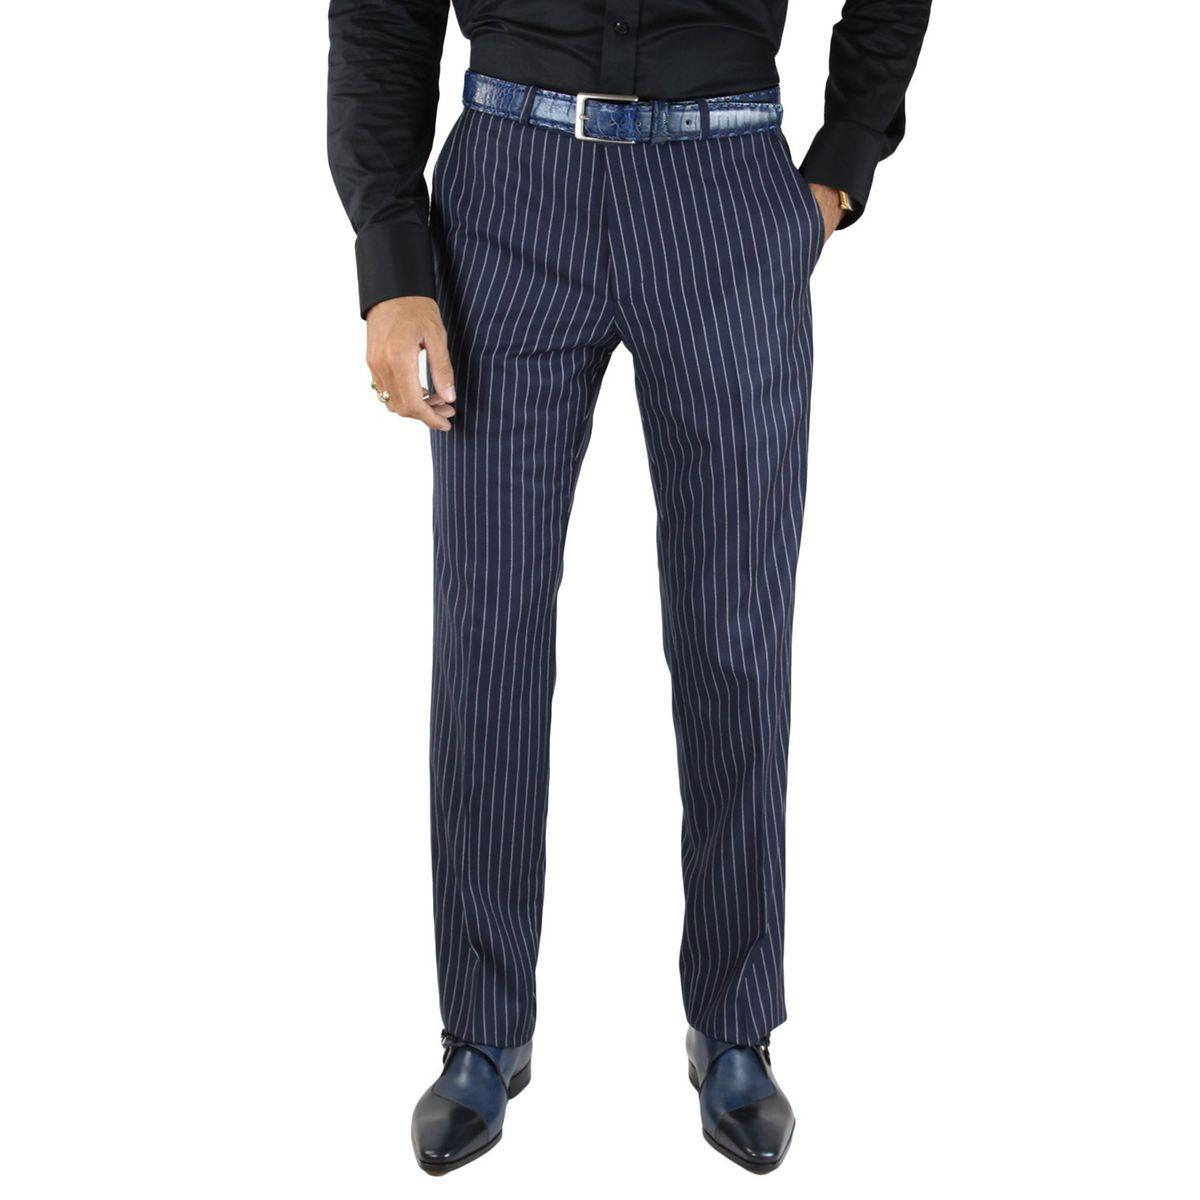 Pantalon Borsalino Marine